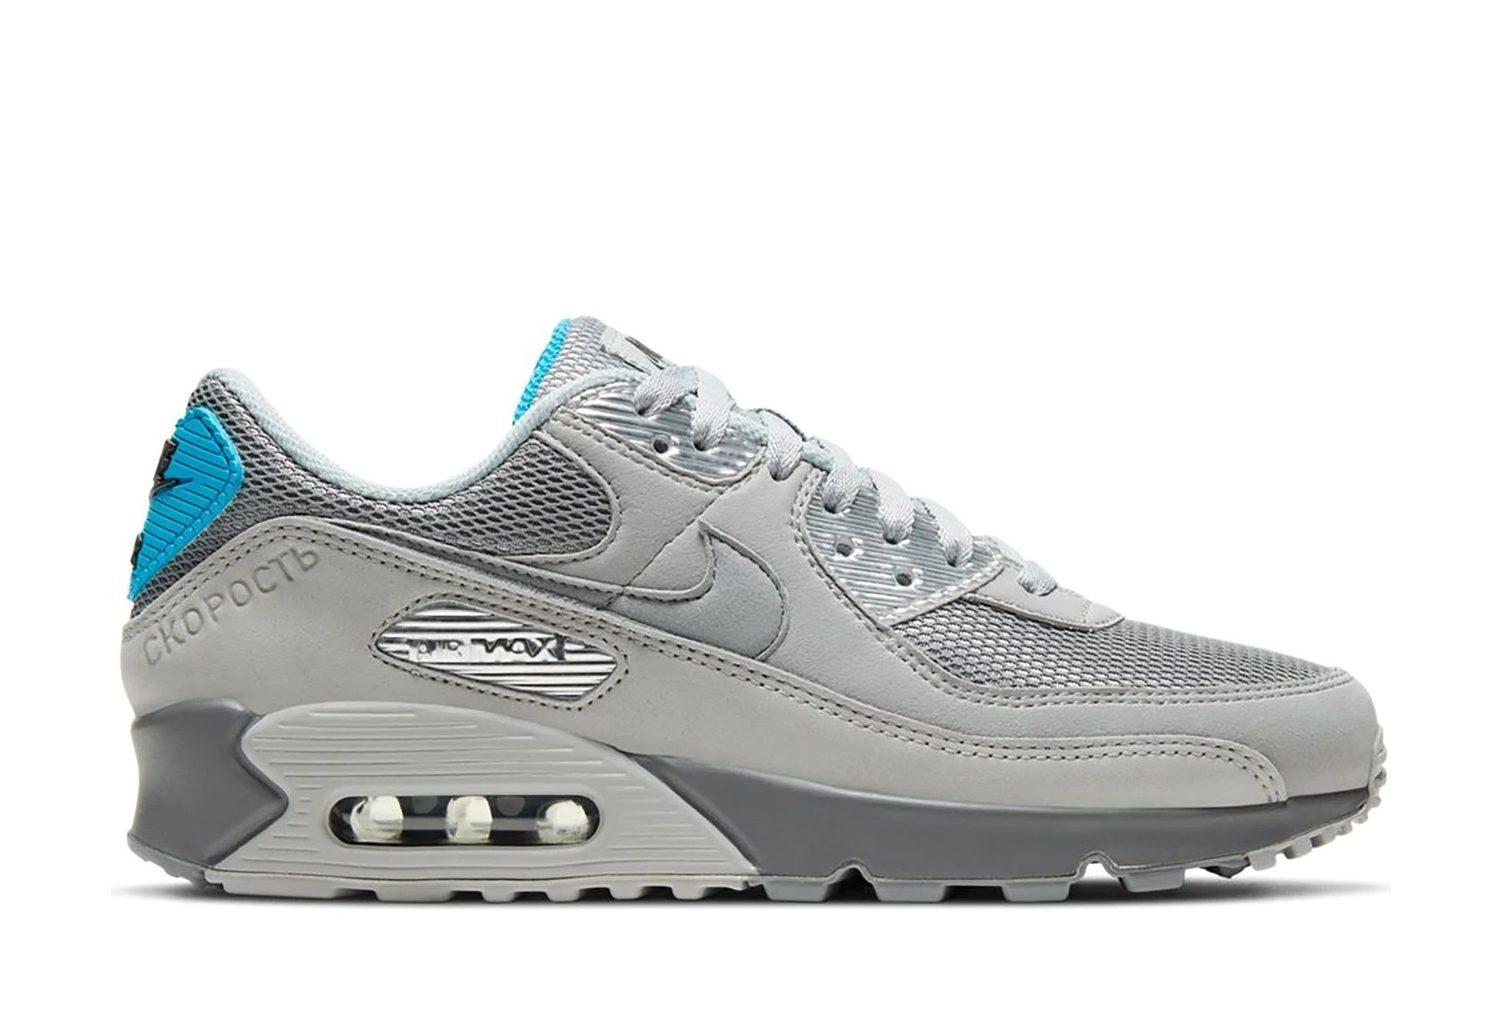 3krossovki-Nike-Air-Max-90-Moscow-2-e1630188216565